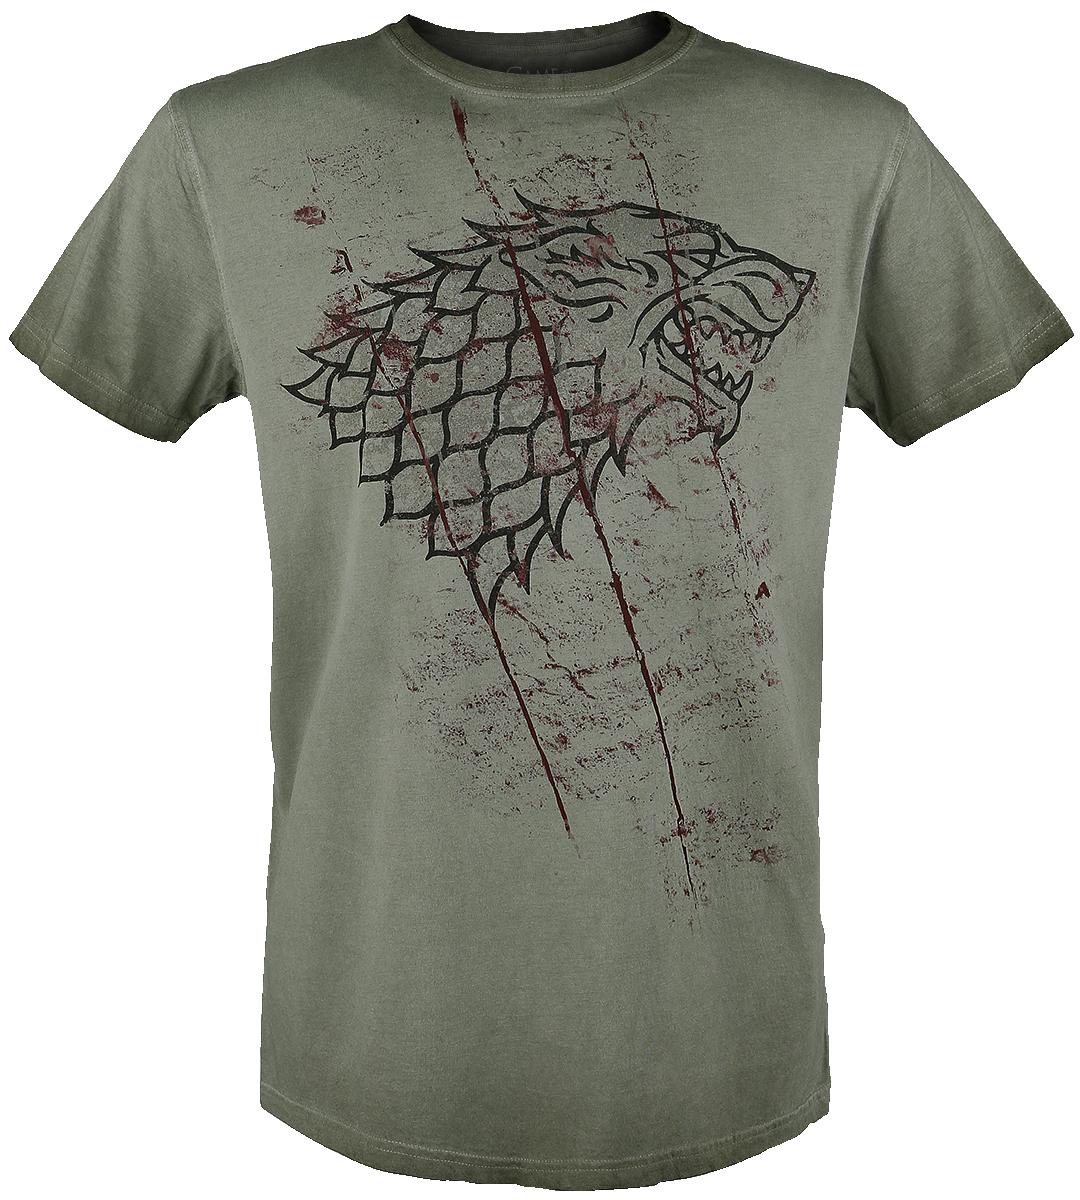 Game of Thrones - Stark Slashed Sigil - T-Shirt - olive image